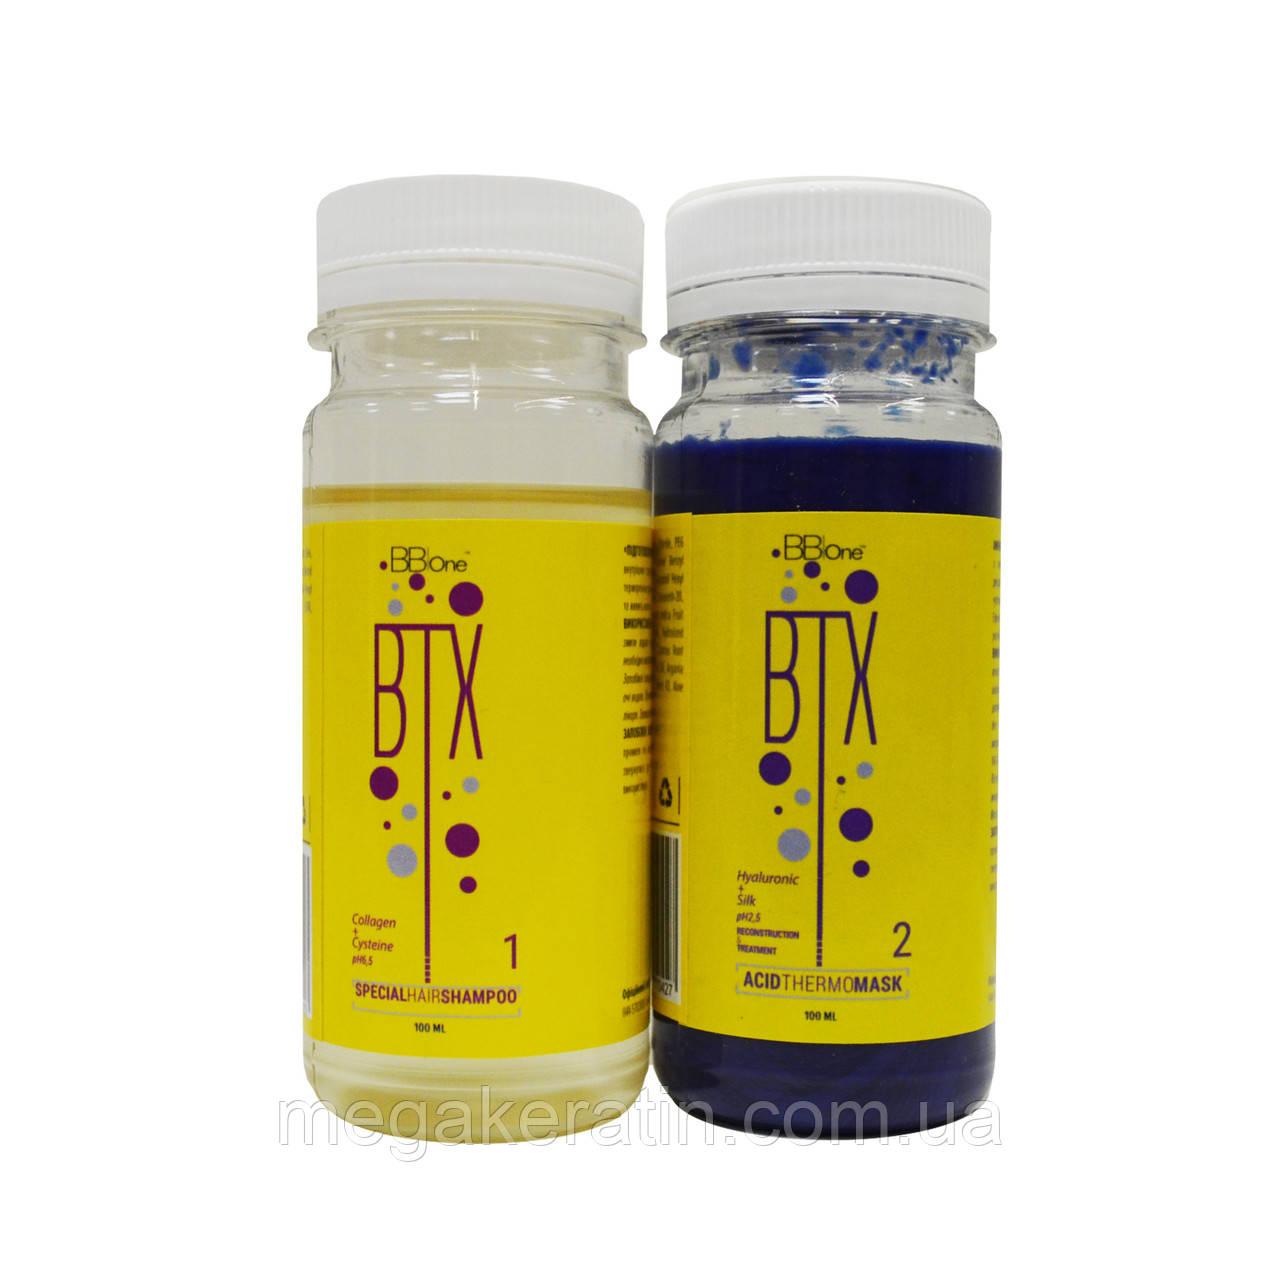 BB One. BTX Acid c синим пигментом - 100 мл (шаг 1) + шампунь - 100 мл. (шаг 2)